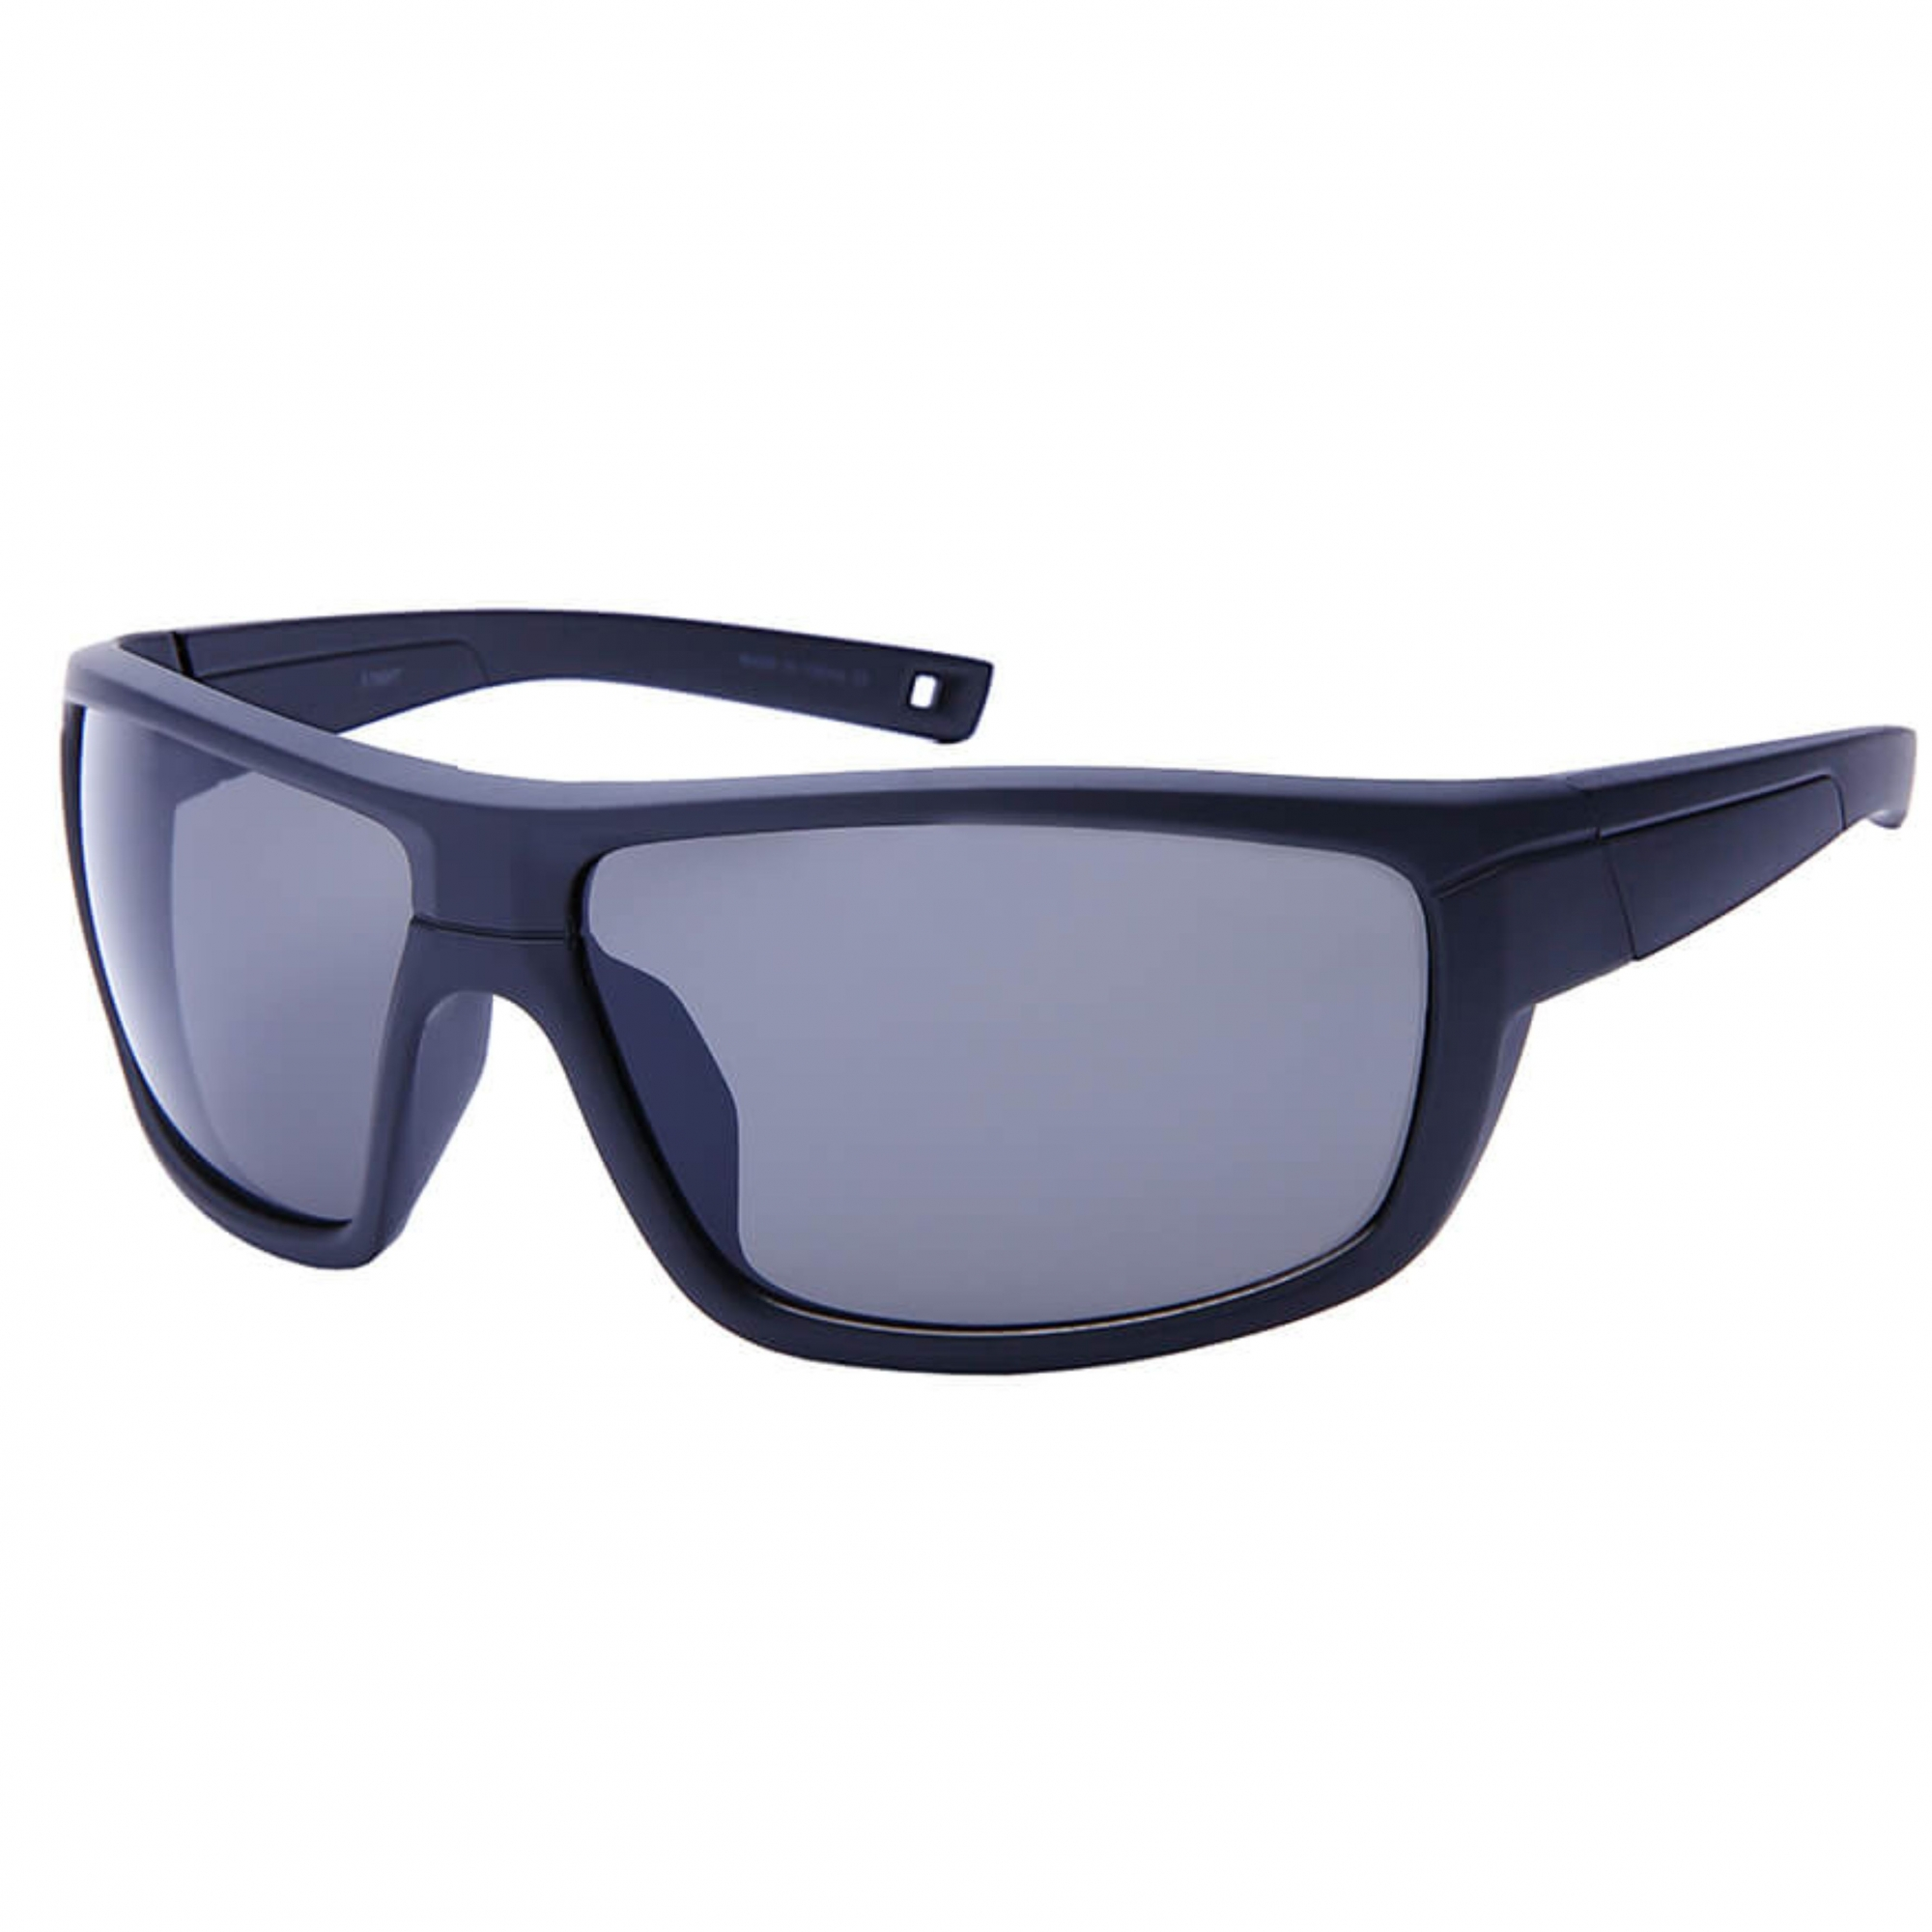 Óculos de Sol Polarizado Express Tocantins Cinza